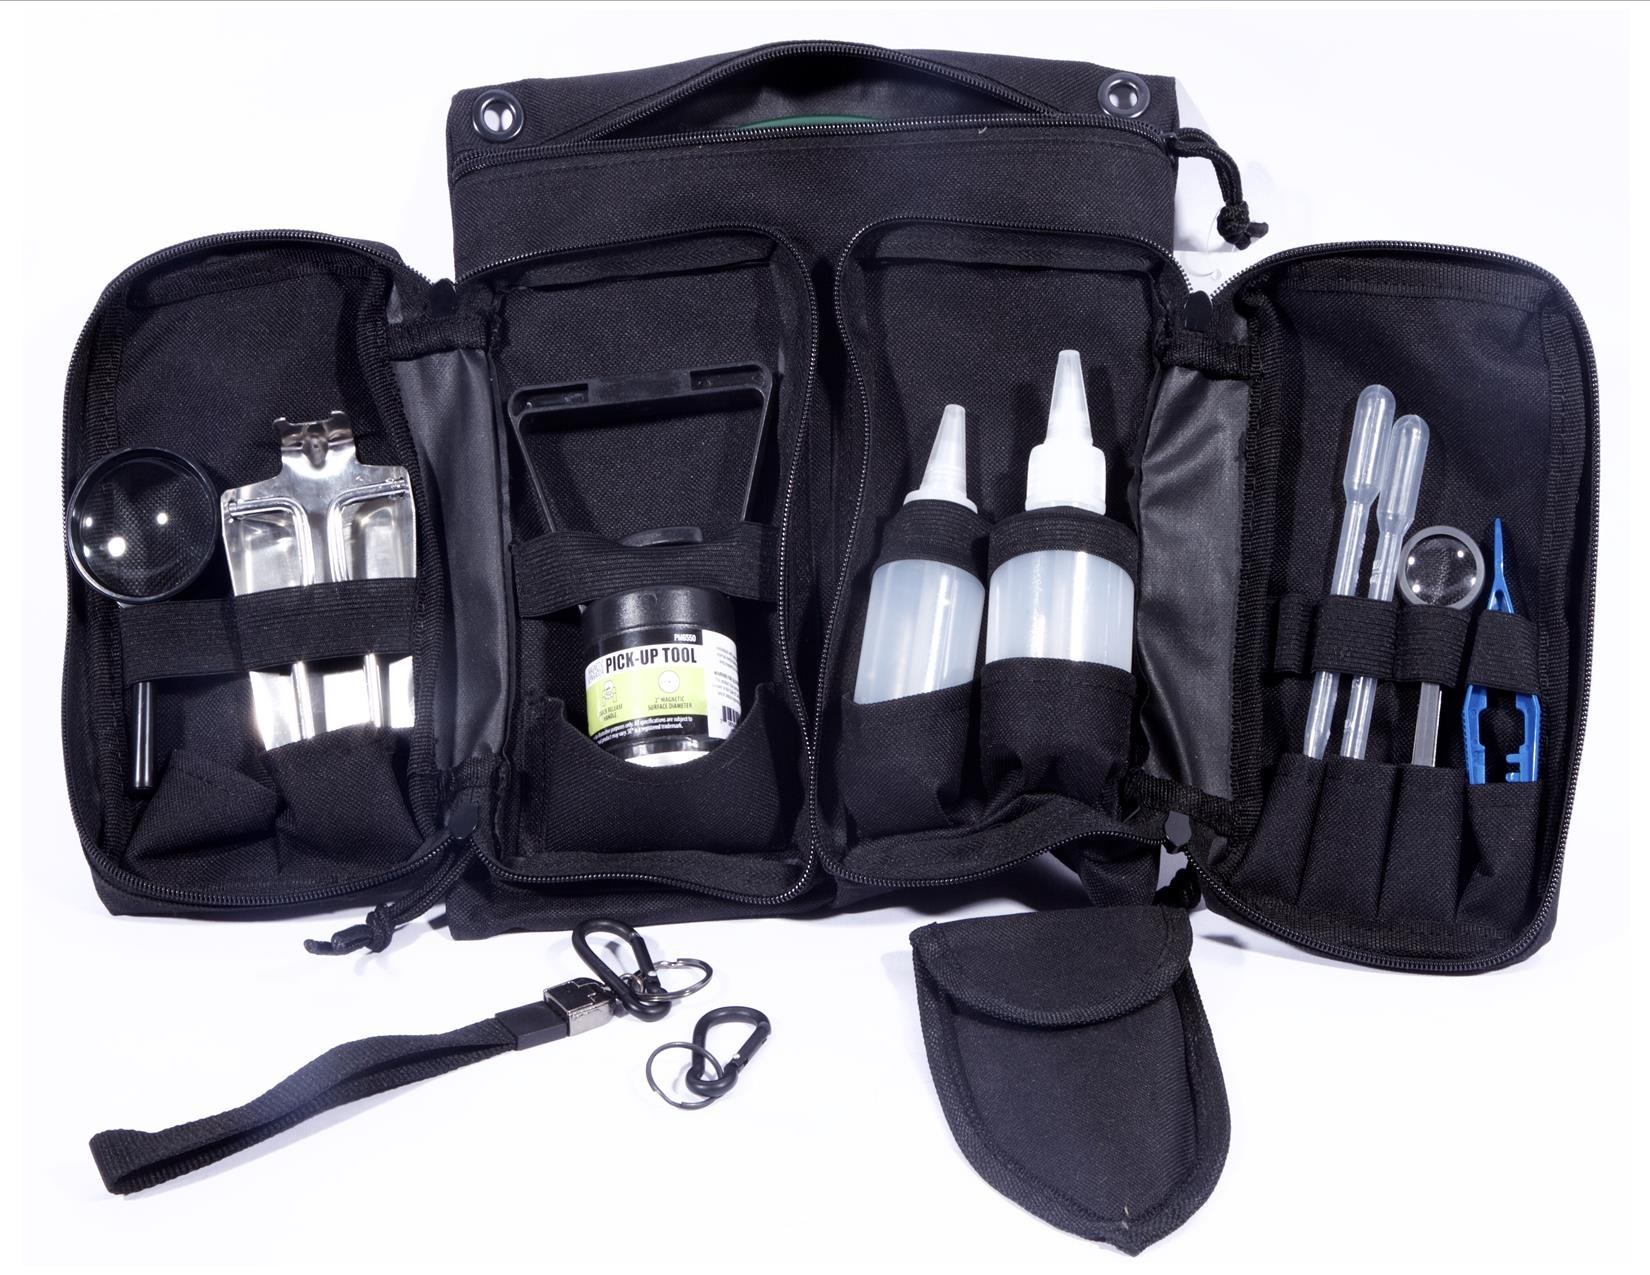 VAS 19 PC Prospectors Gold Panning Essentials Set Kit | Molle Bag | Magnetic Separator | Snifter Bottles | Trowel | Adults | Kids | Beginners Too! | Equipment for Metal Detecting & Gold Panning